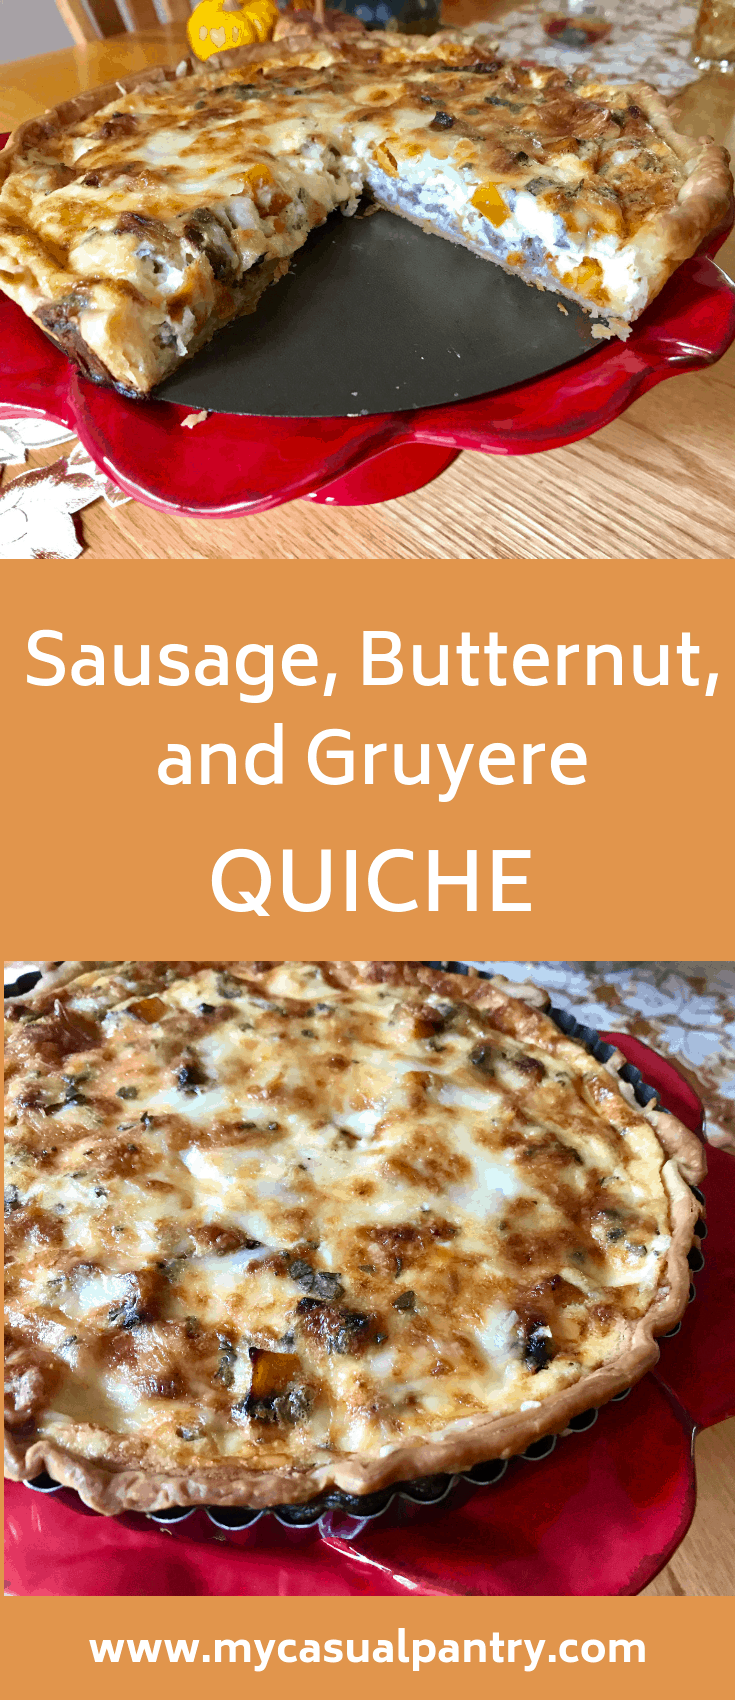 Sausage Butternut and Gruyere Quiche